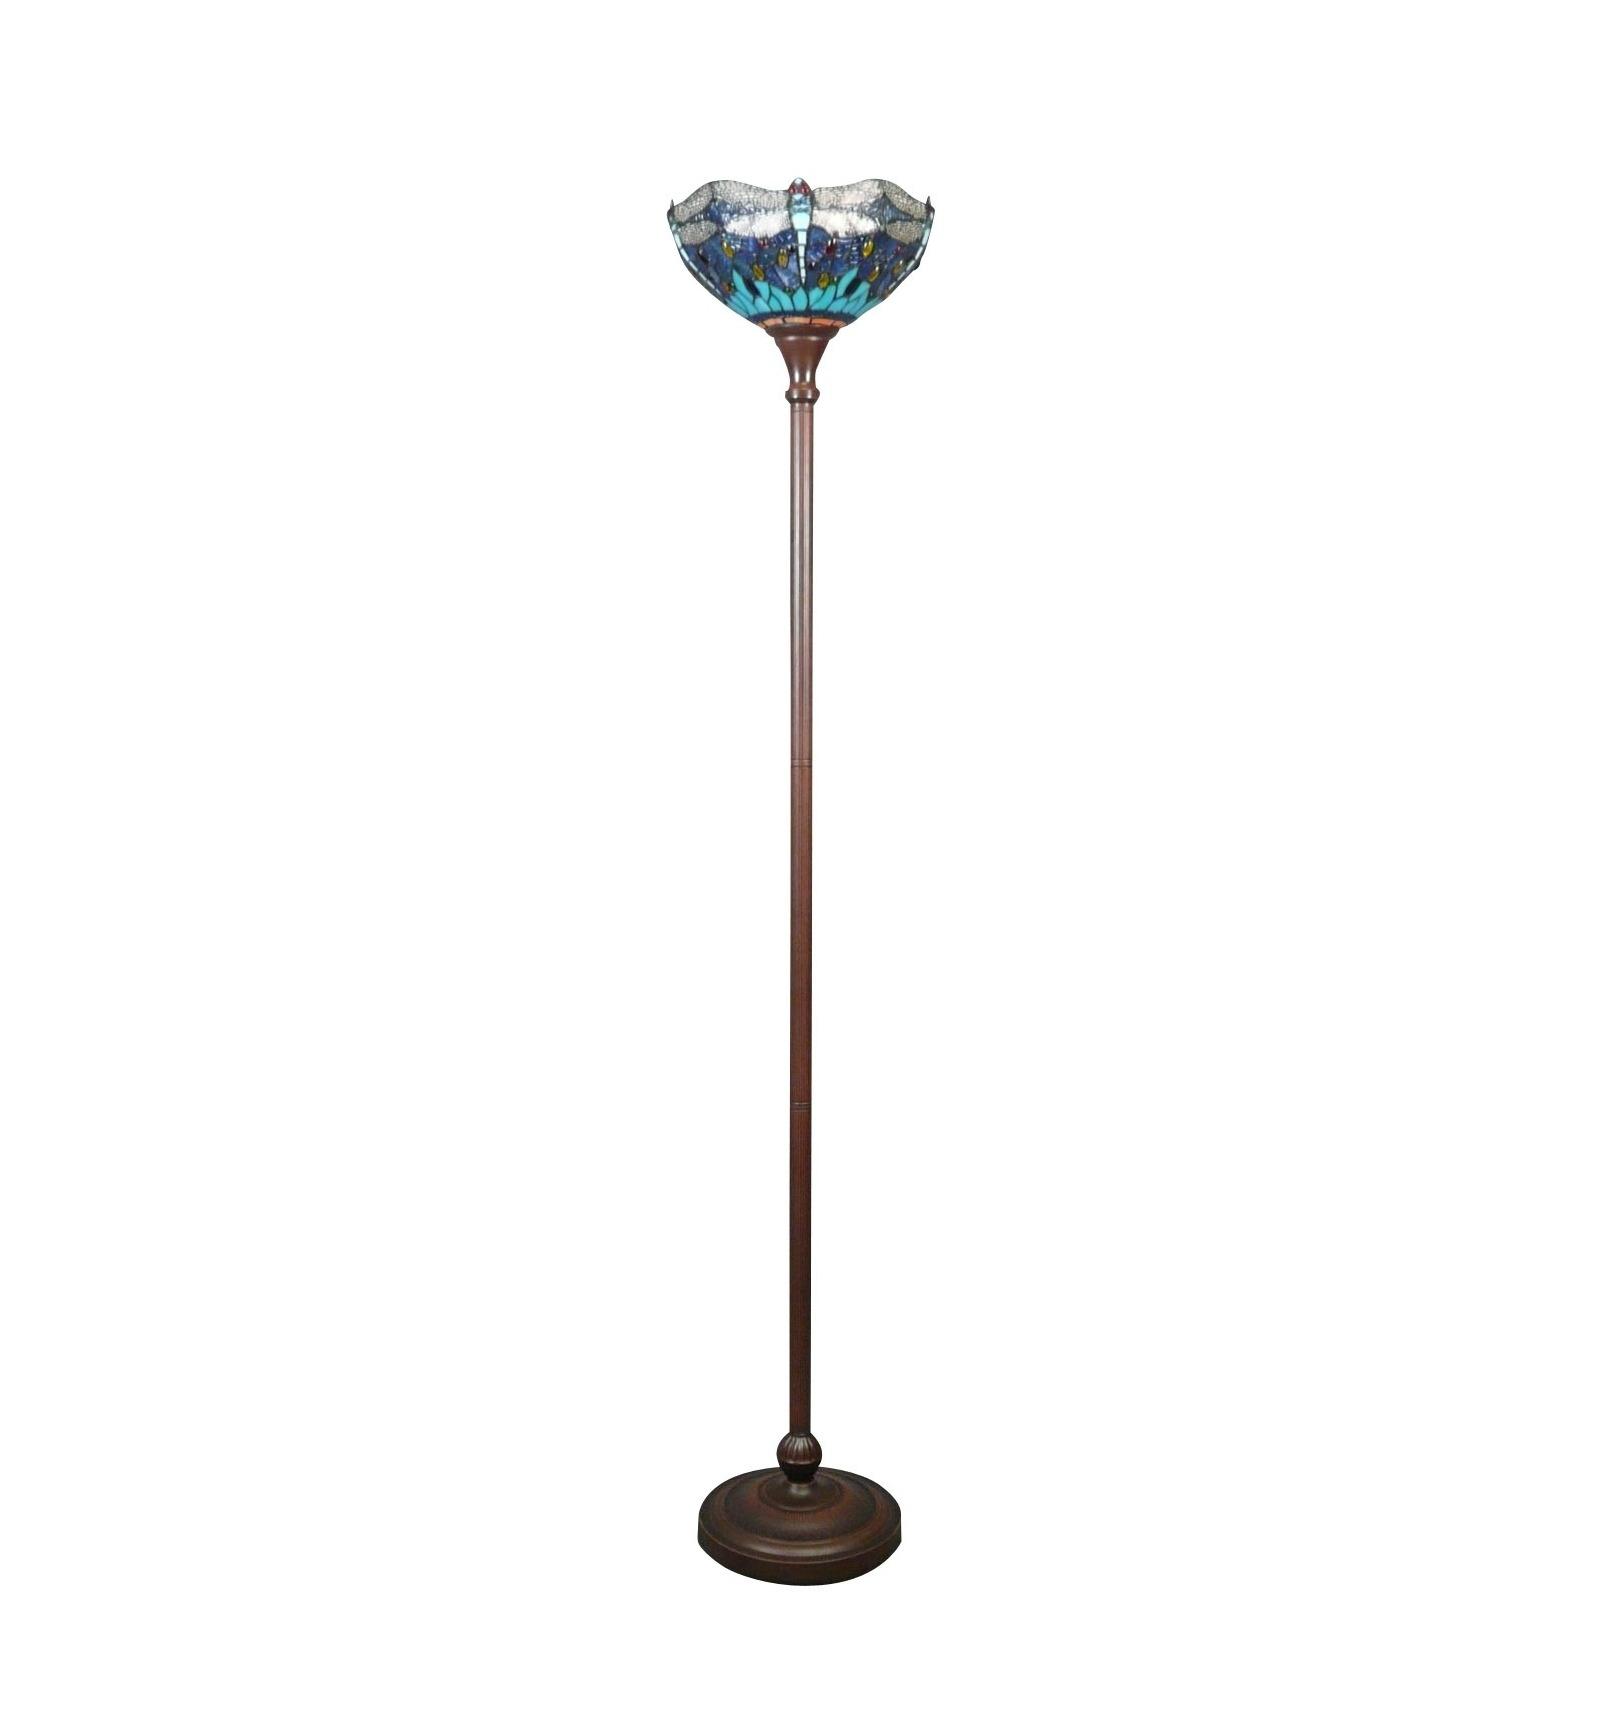 tiffany dragonfly floor lamp. Black Bedroom Furniture Sets. Home Design Ideas